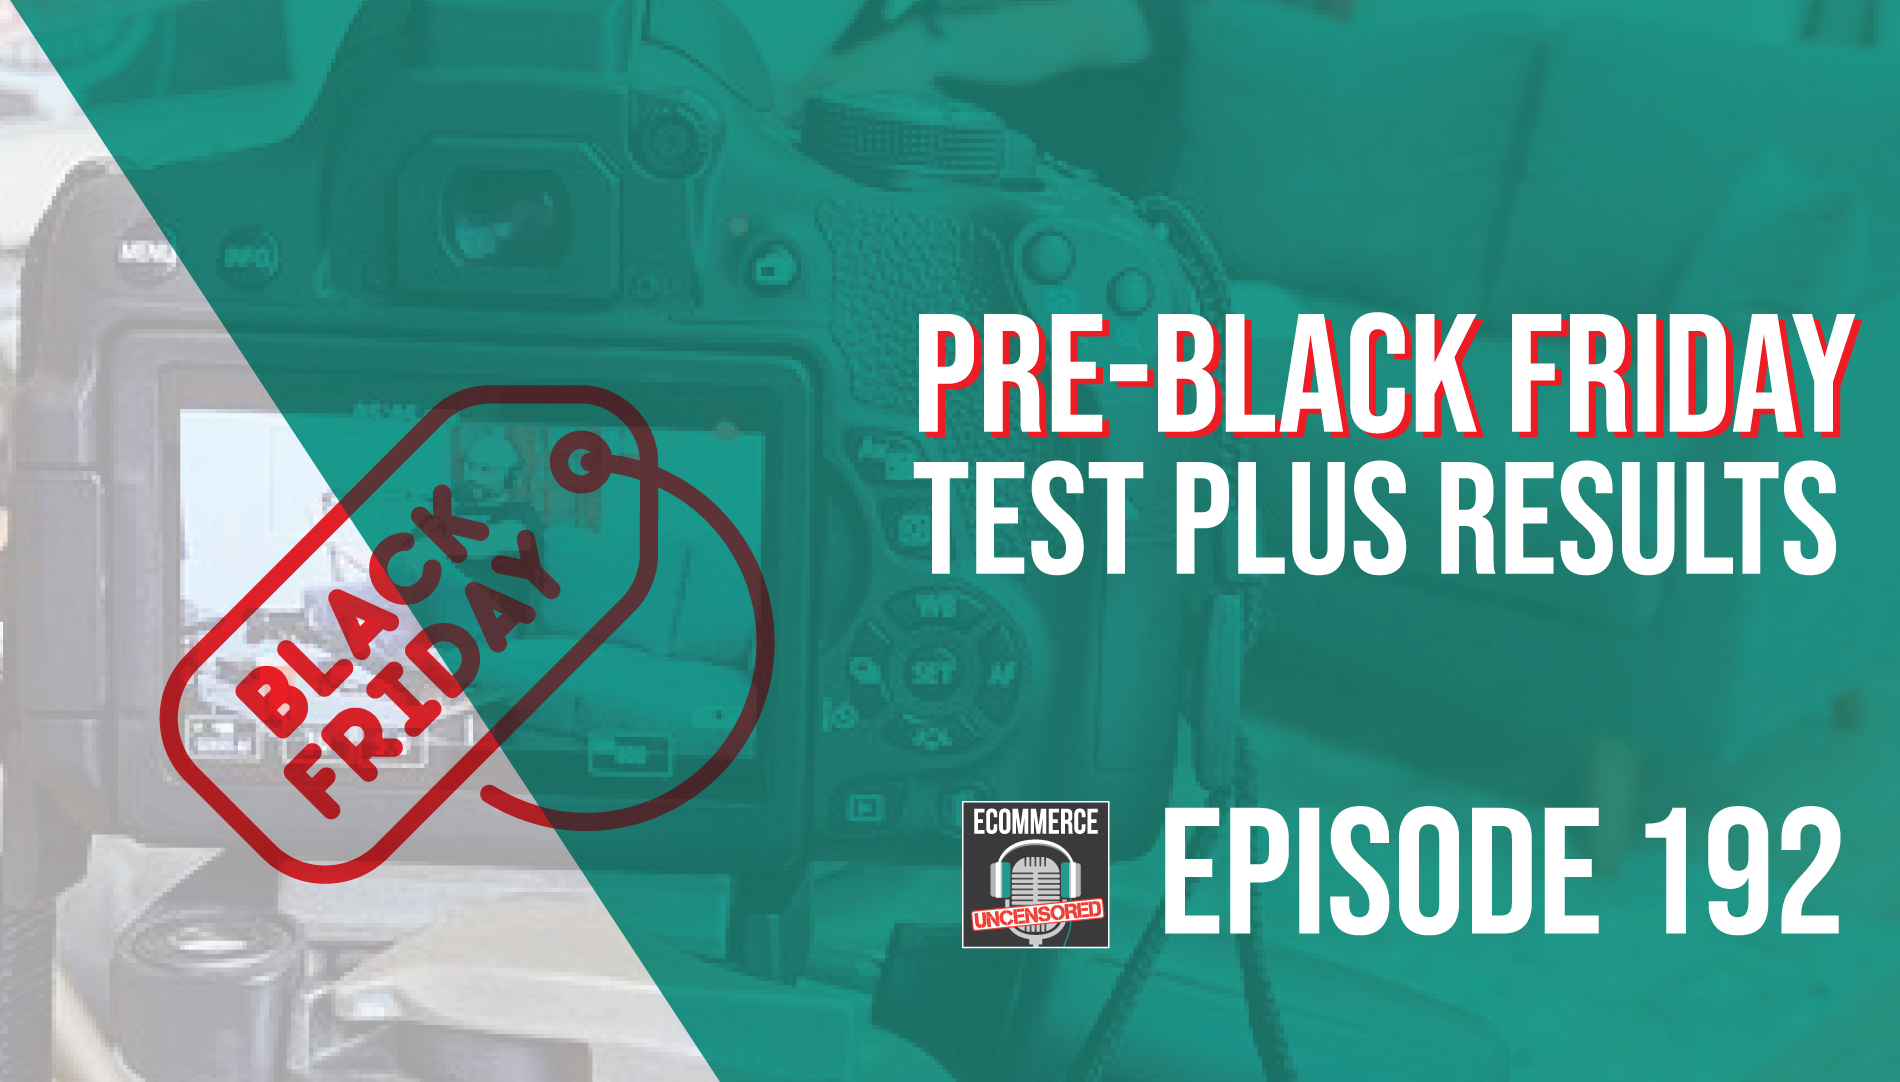 Eu192 Pre Black Friday Test Plus Results